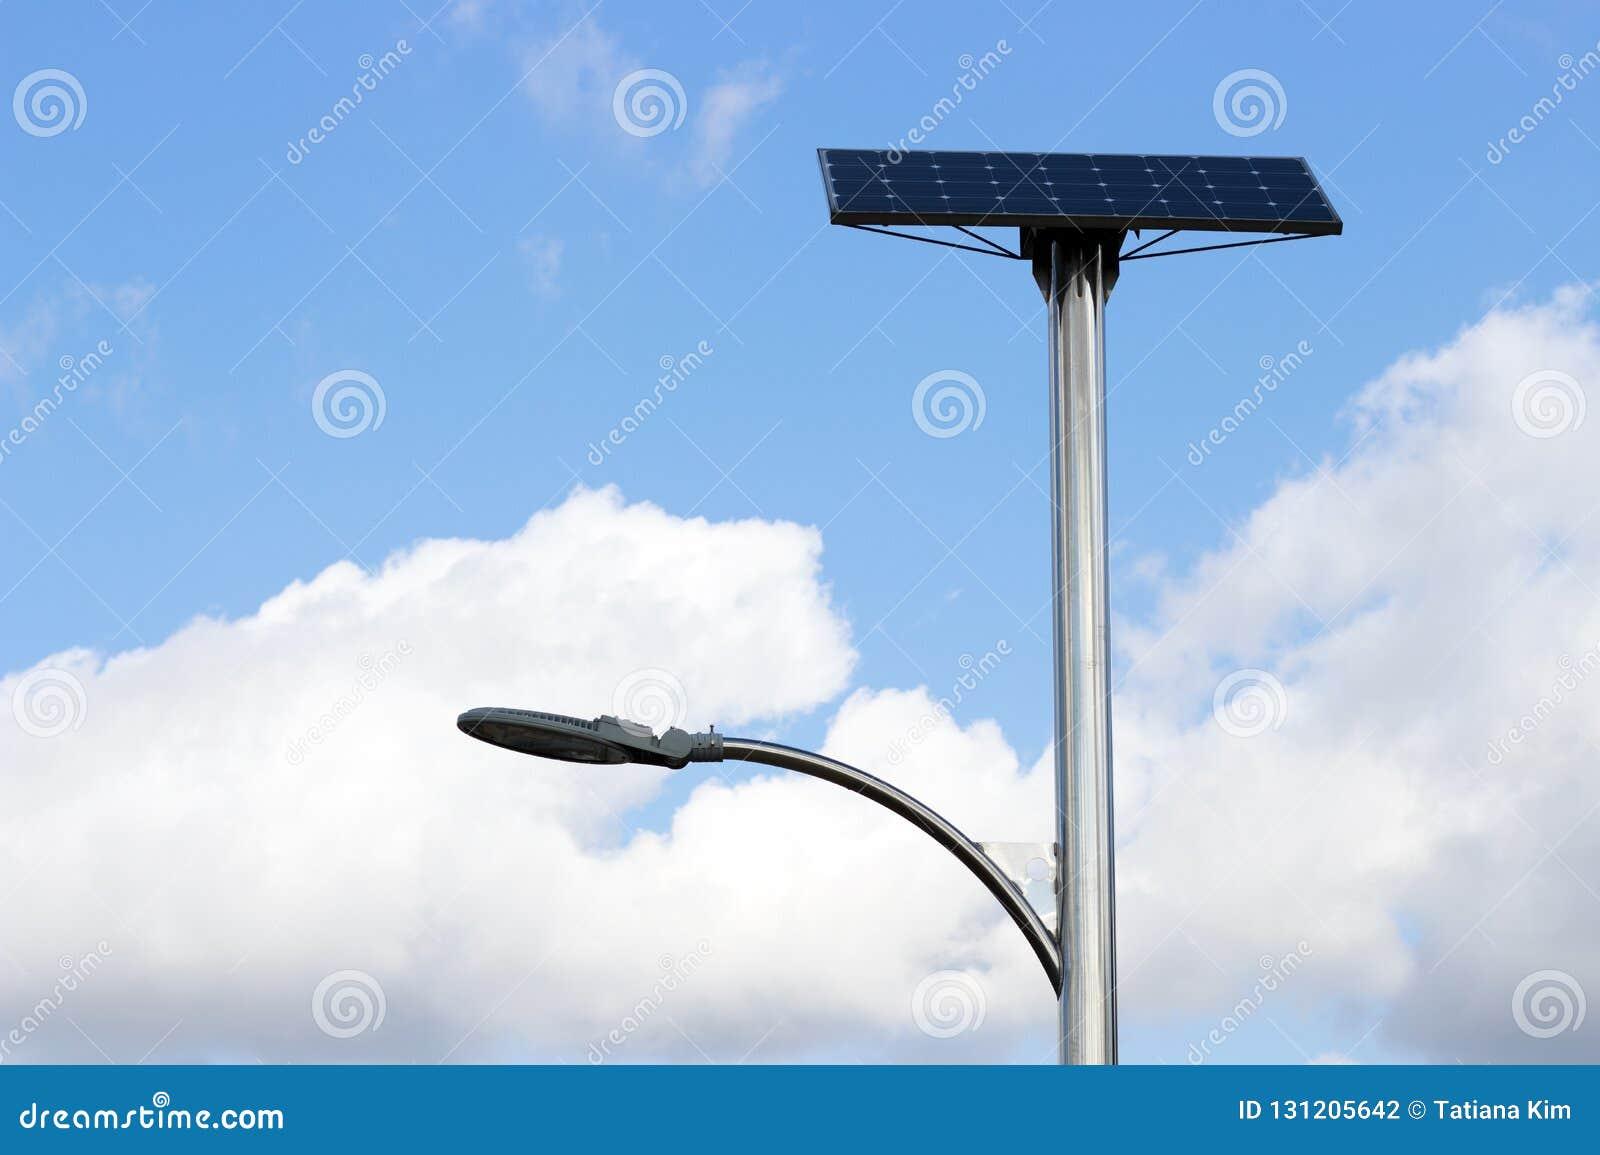 Solar Street Light Stock Image Cartoondealer Com 52456915